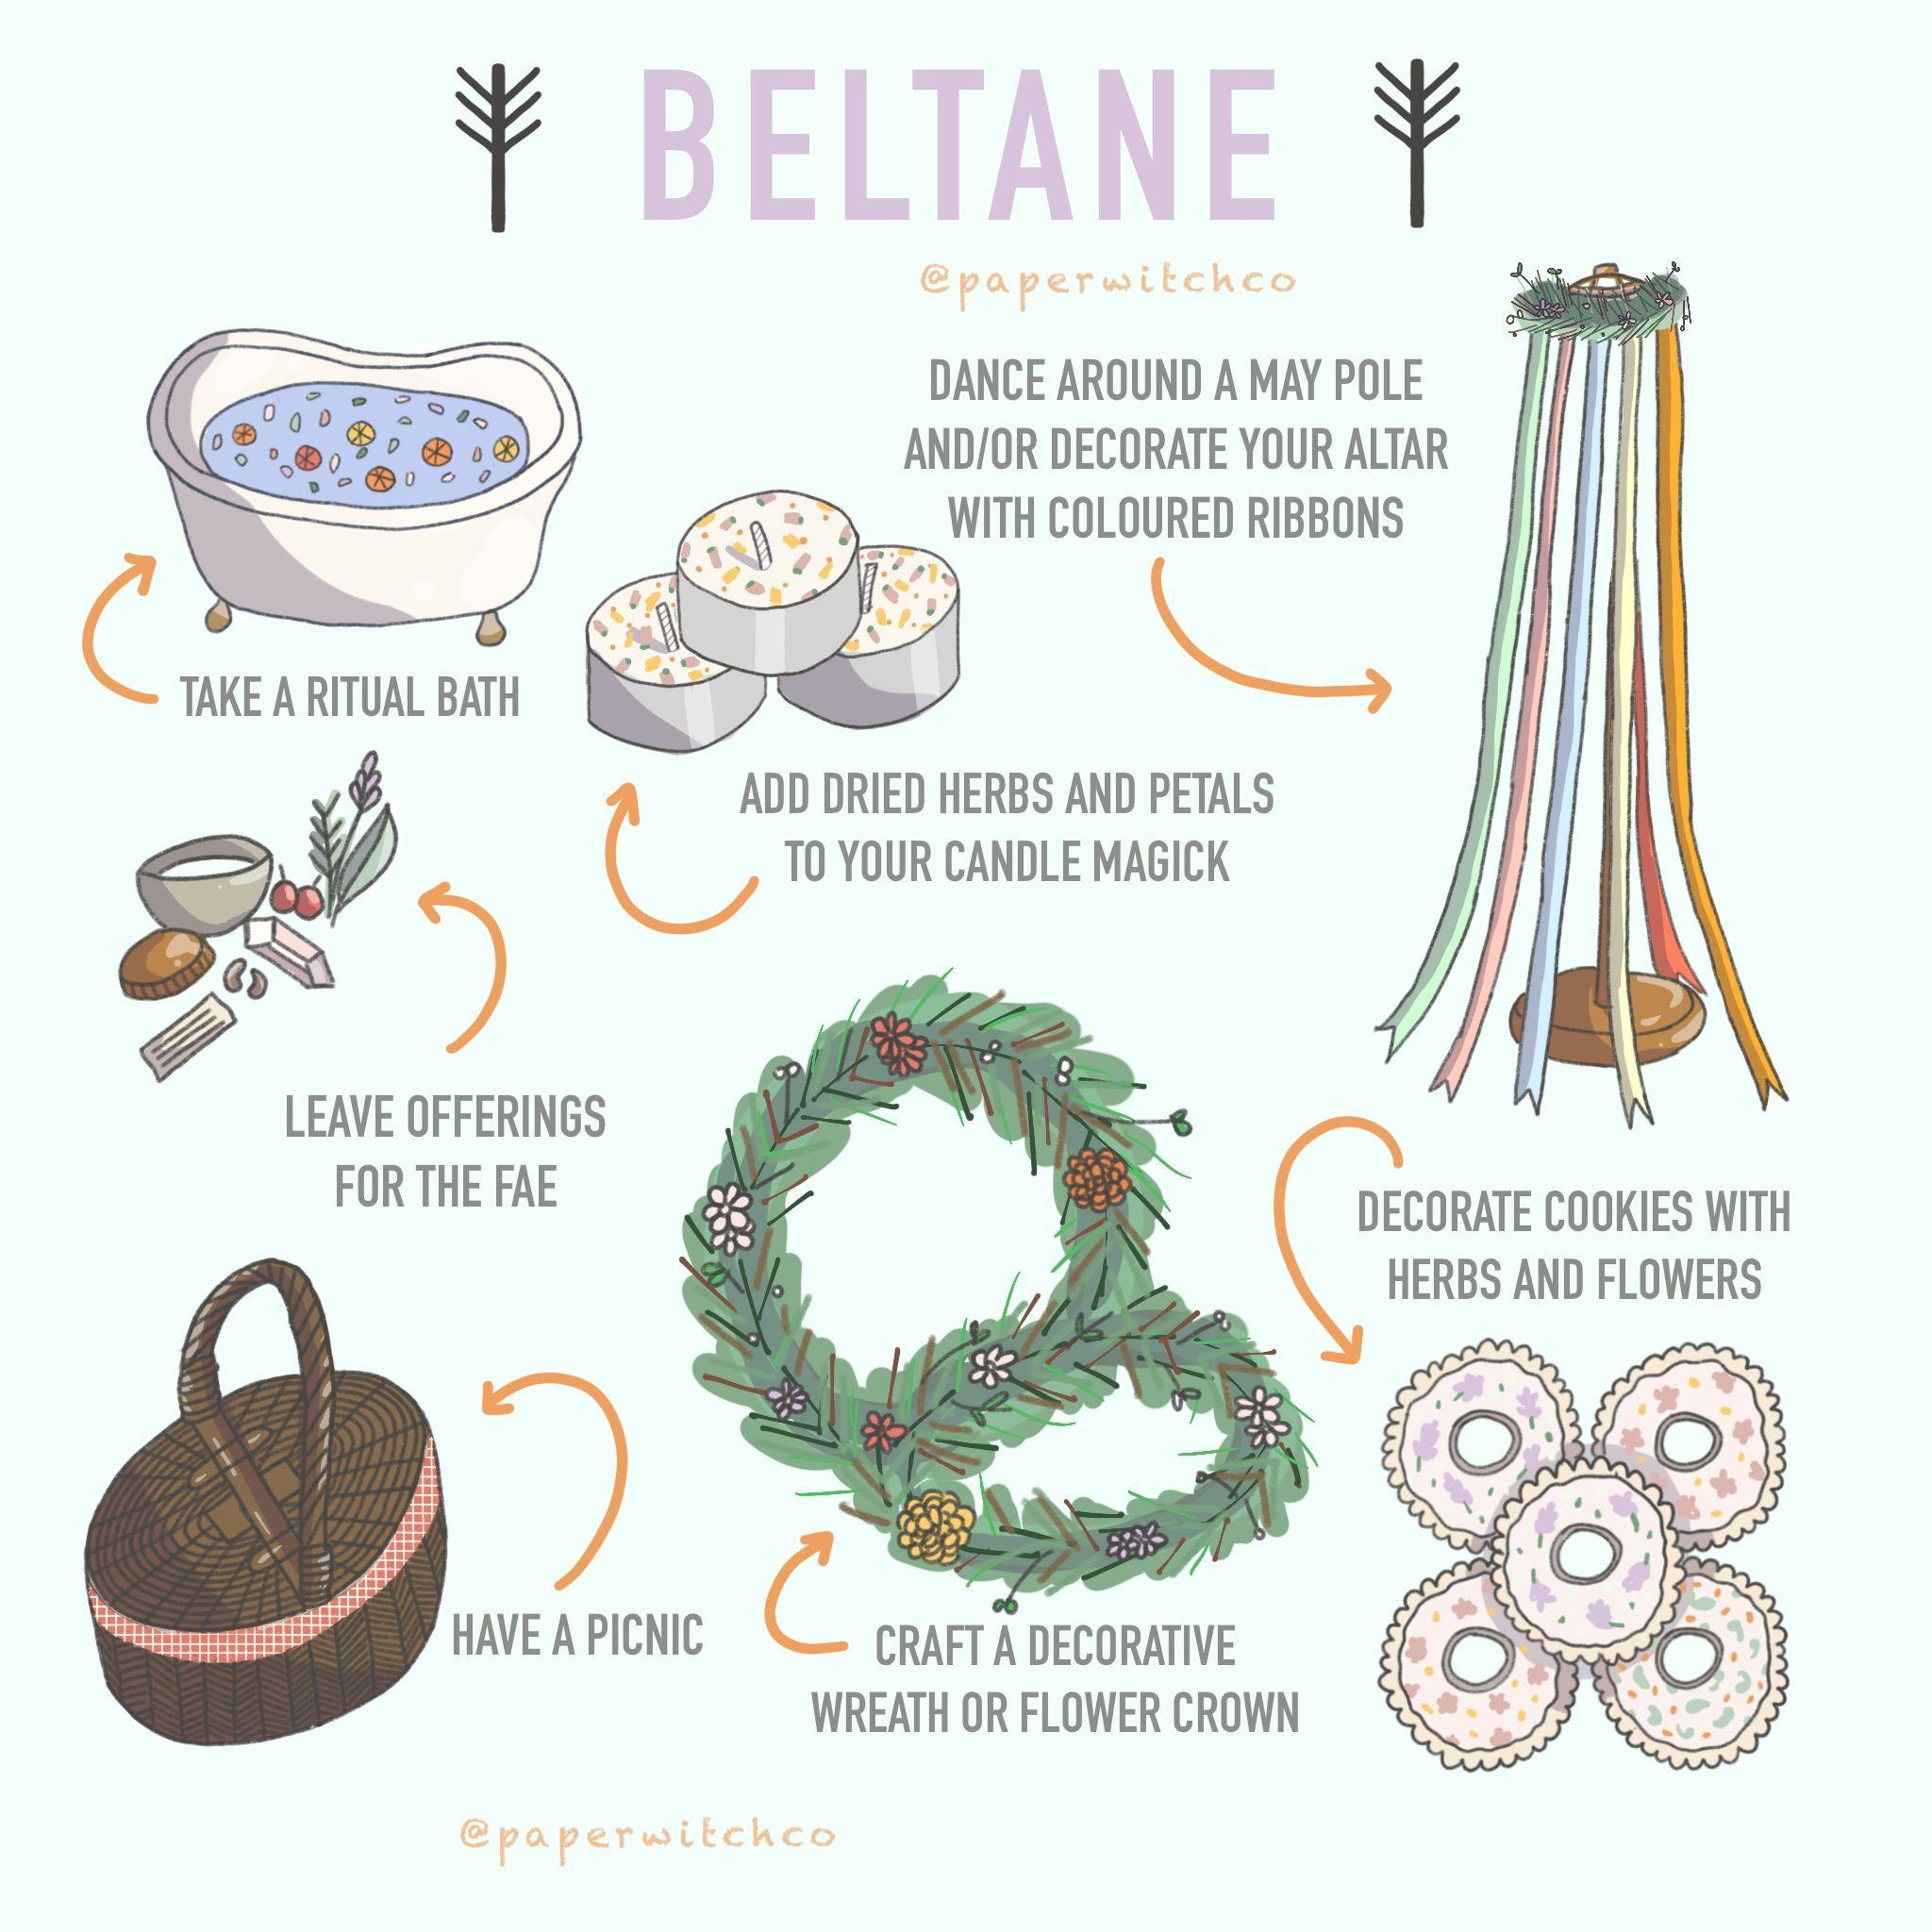 Etsy listing for planner stickers celebrating the pagan sabbat Beltane #beltane #witch #witchcraft #sabbat